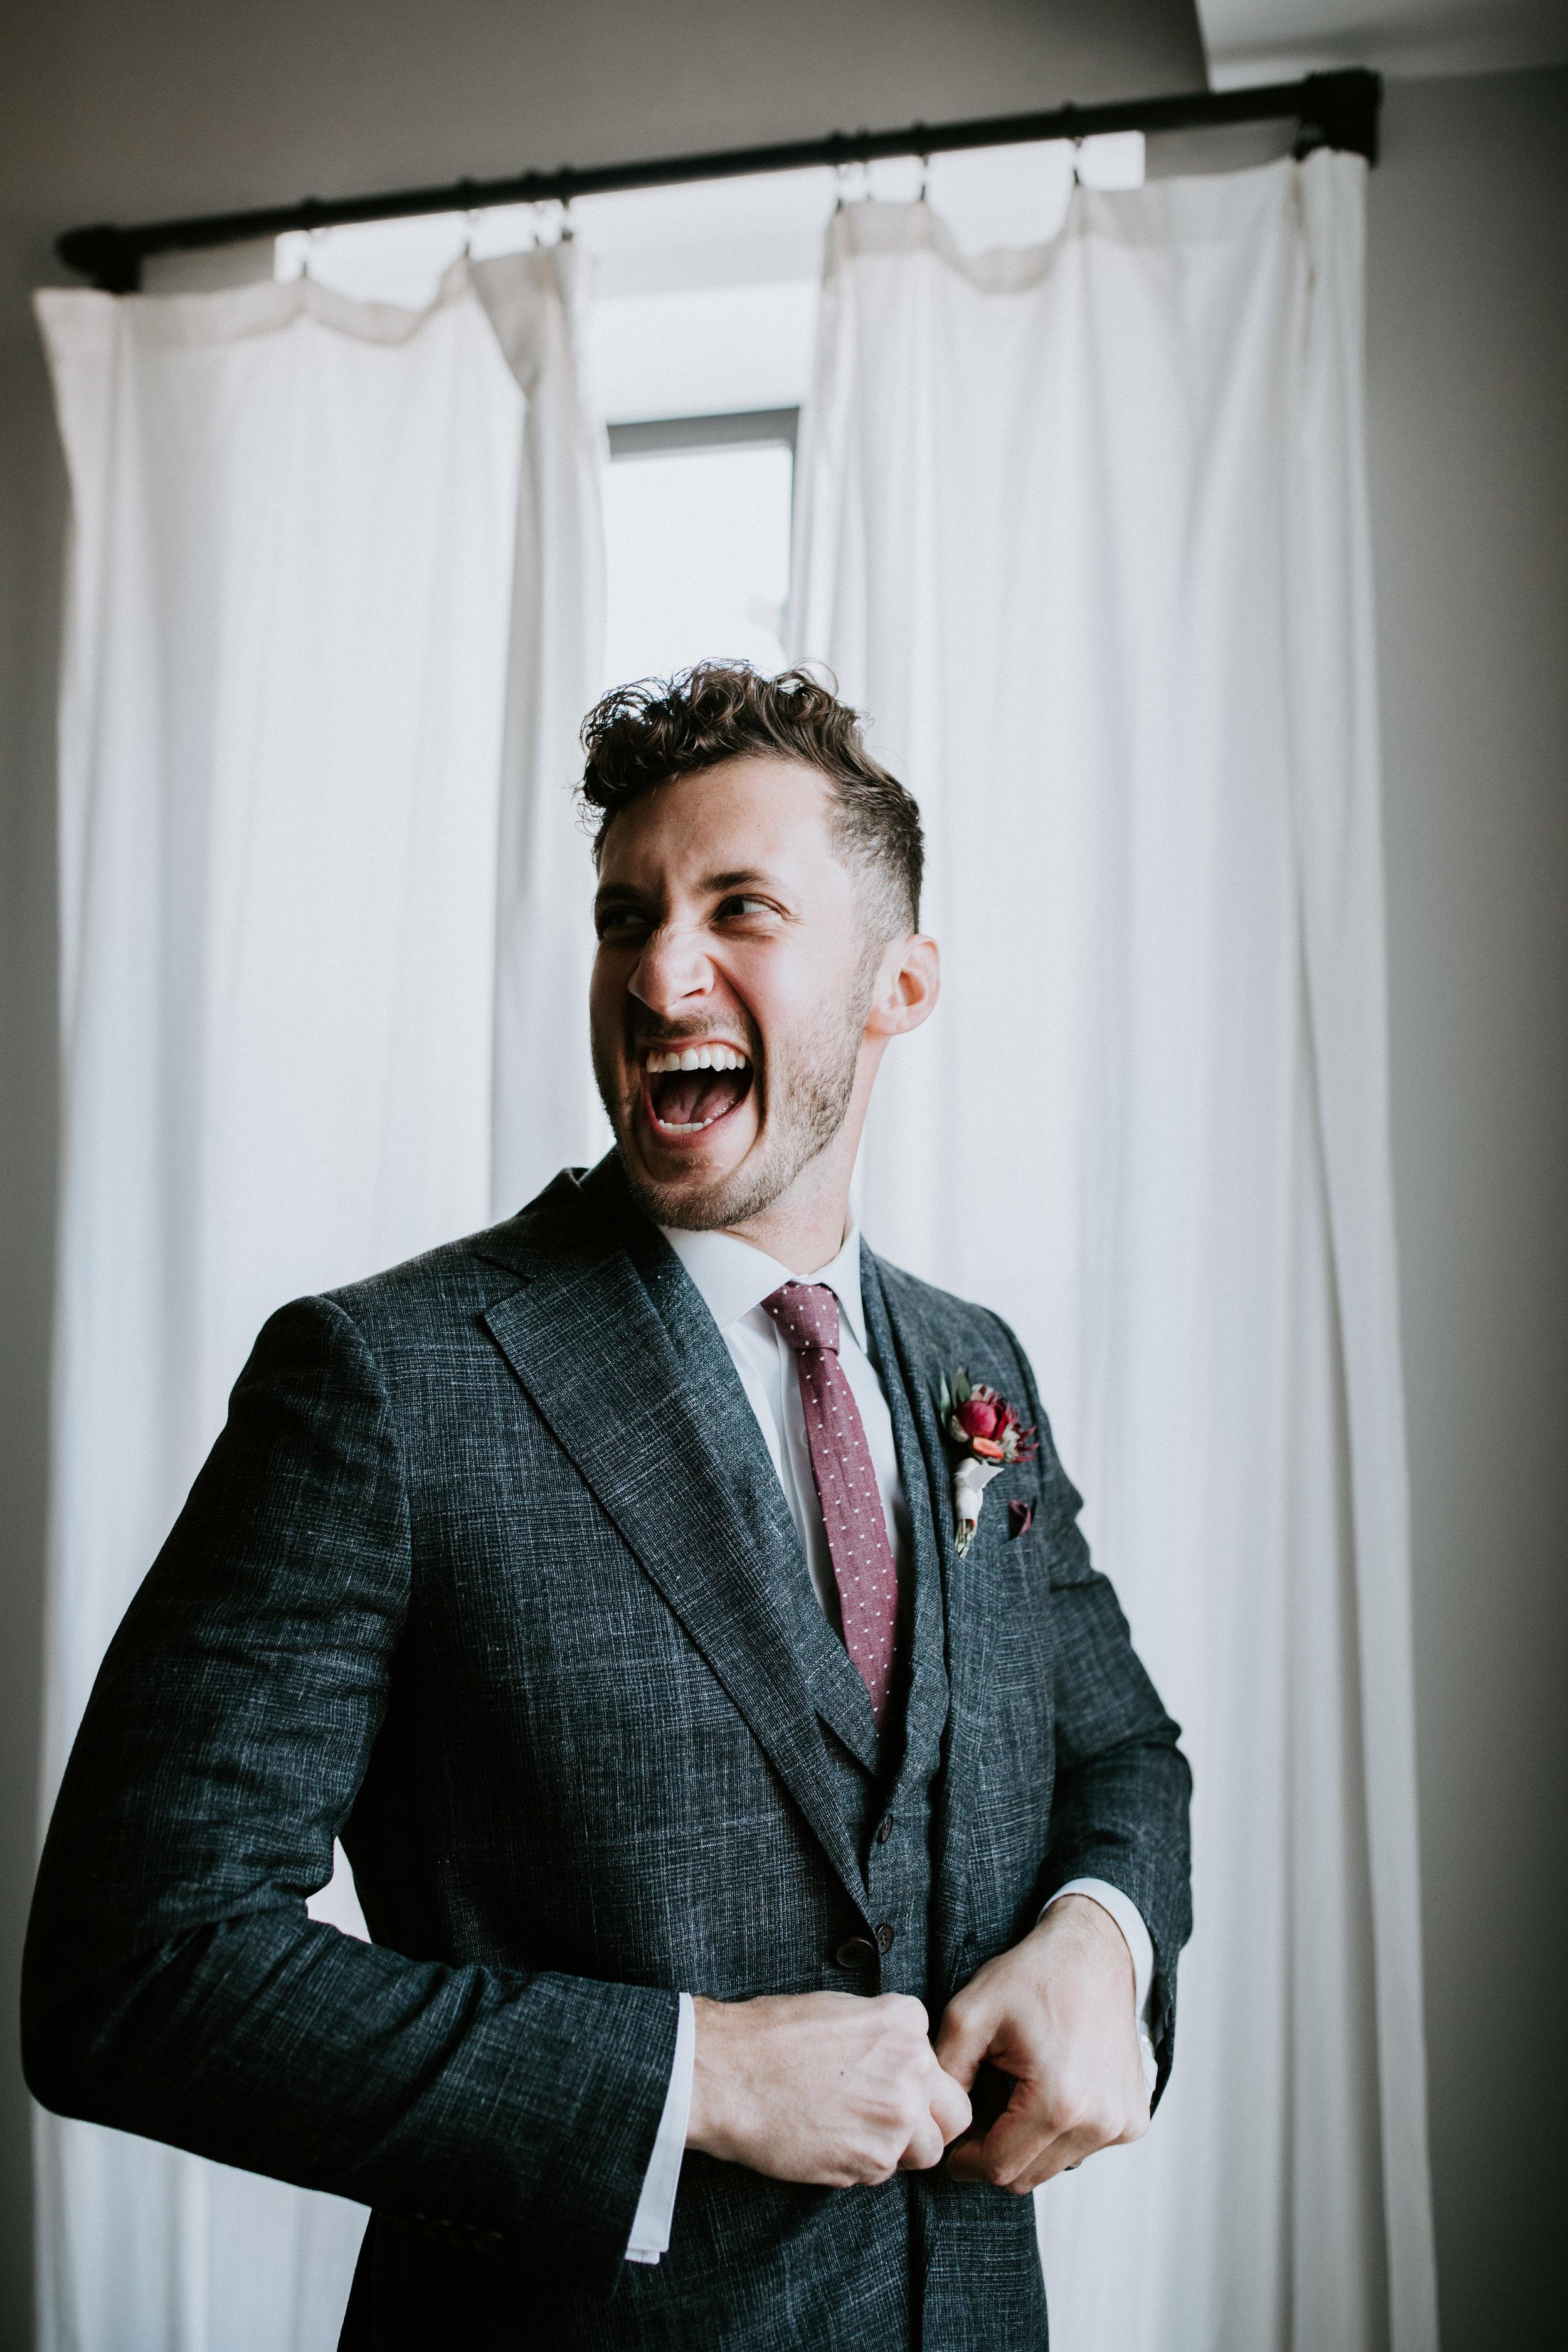 ST_LOUIS_WEDDING_PHOTOGRAPHER_WILD_CARROT_EMILY_AND_JOES_WINTER_WEDDING-337.jpg